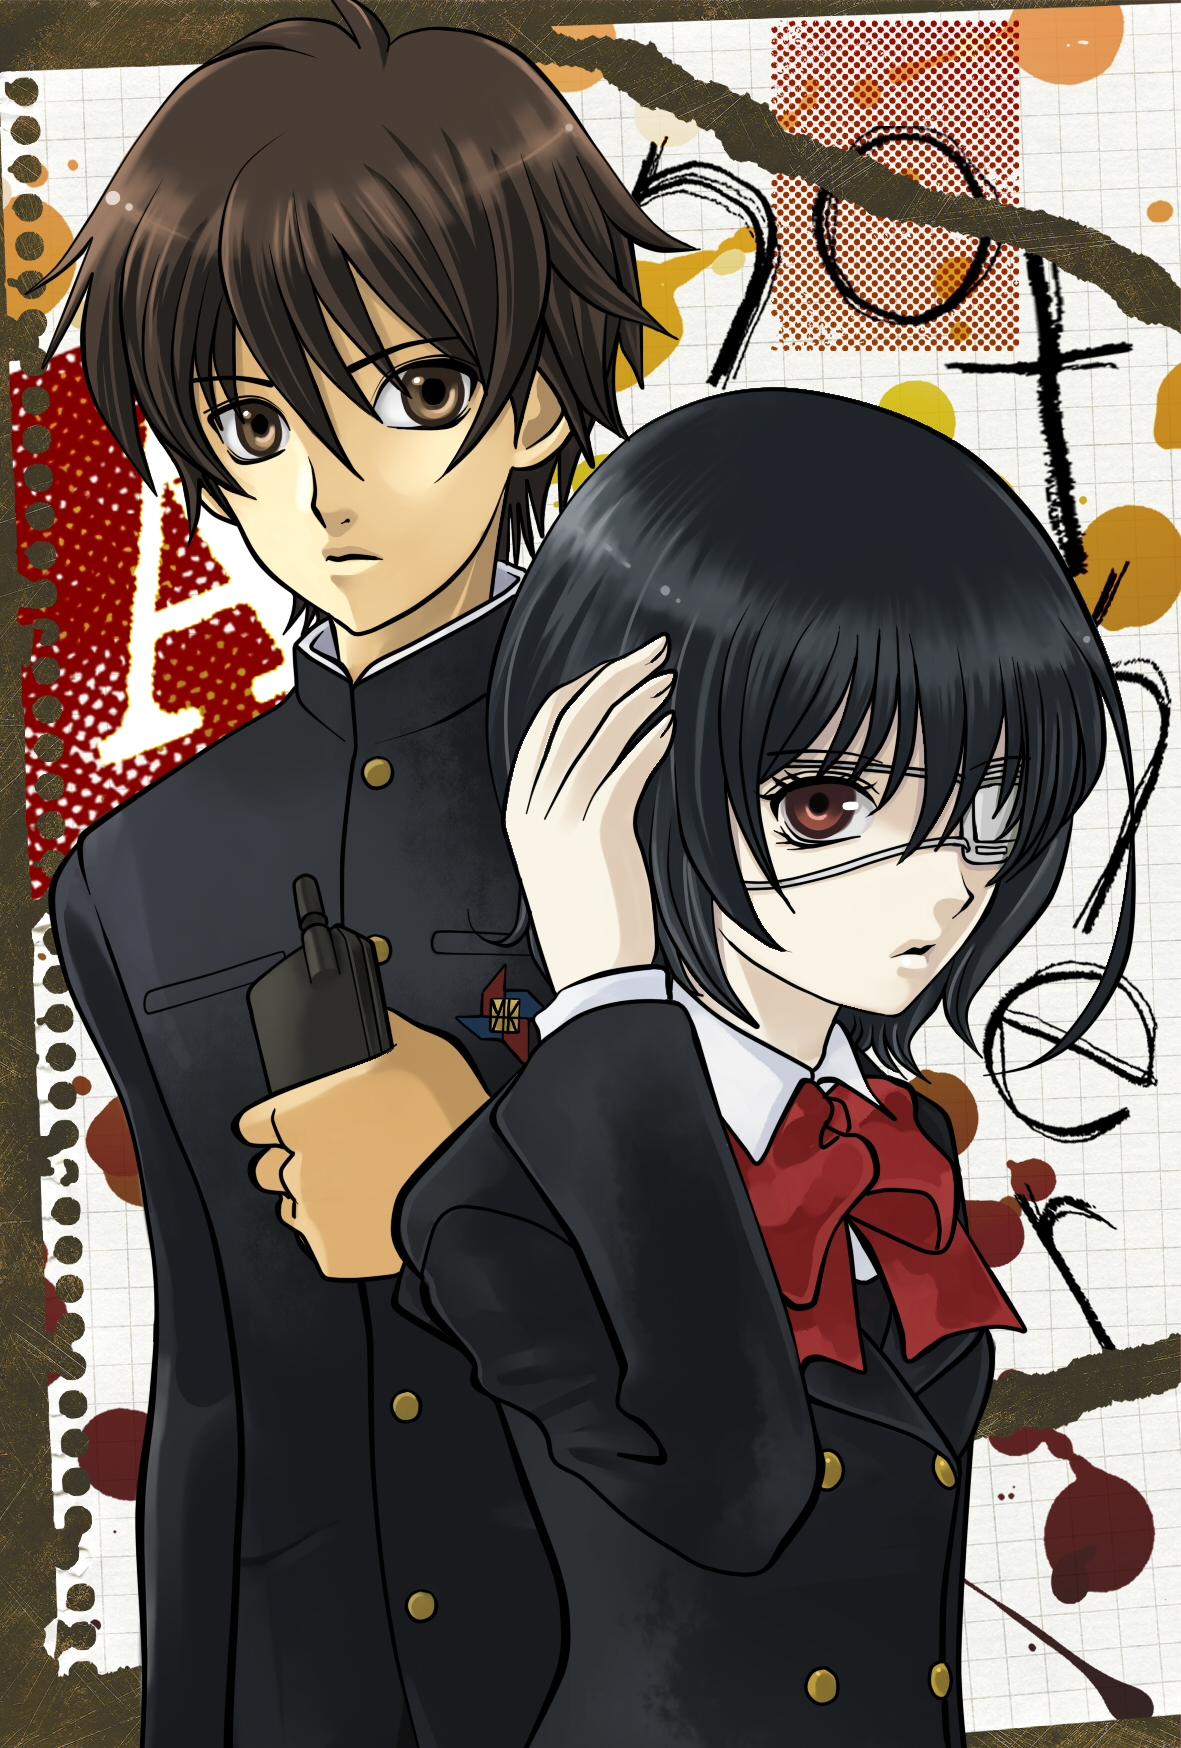 Another/#1034533 - Zerochan Another Kouichi And Misaki